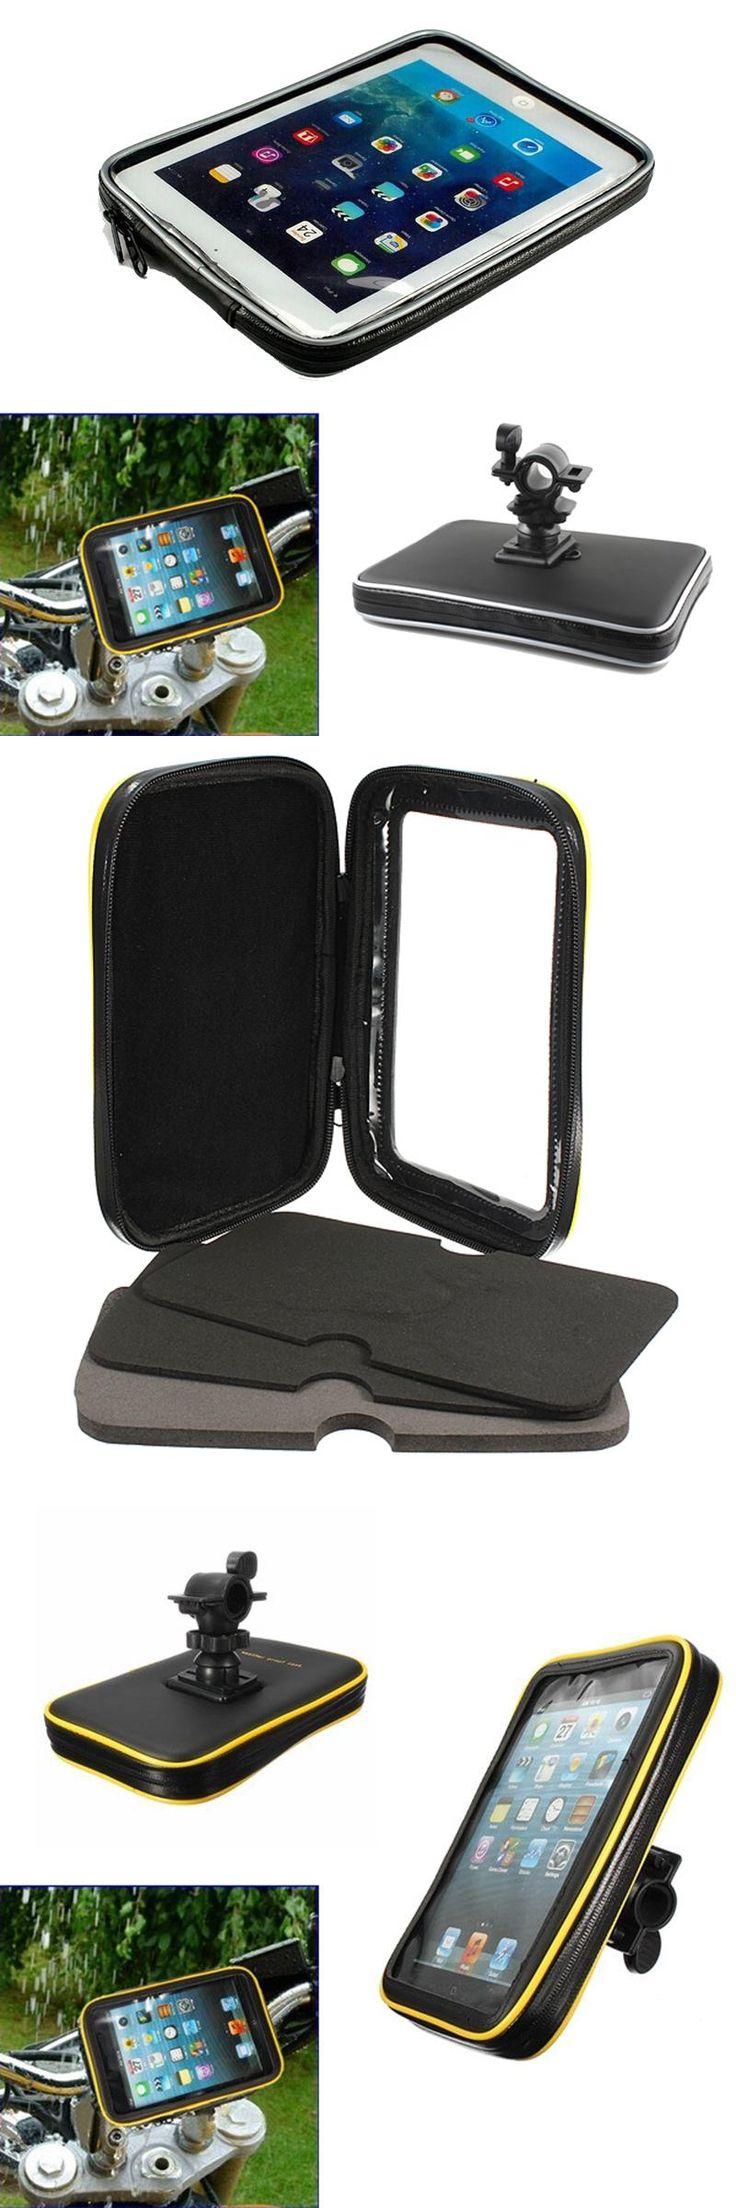 [Visit to Buy] Bicycle Motor Bike Motorcycle Handle Bar Tablet Holder Waterproof Case Bag For Samsung galaxy Tab 4 3 2 7'' for iPad Mini 3 2 1 #Advertisement